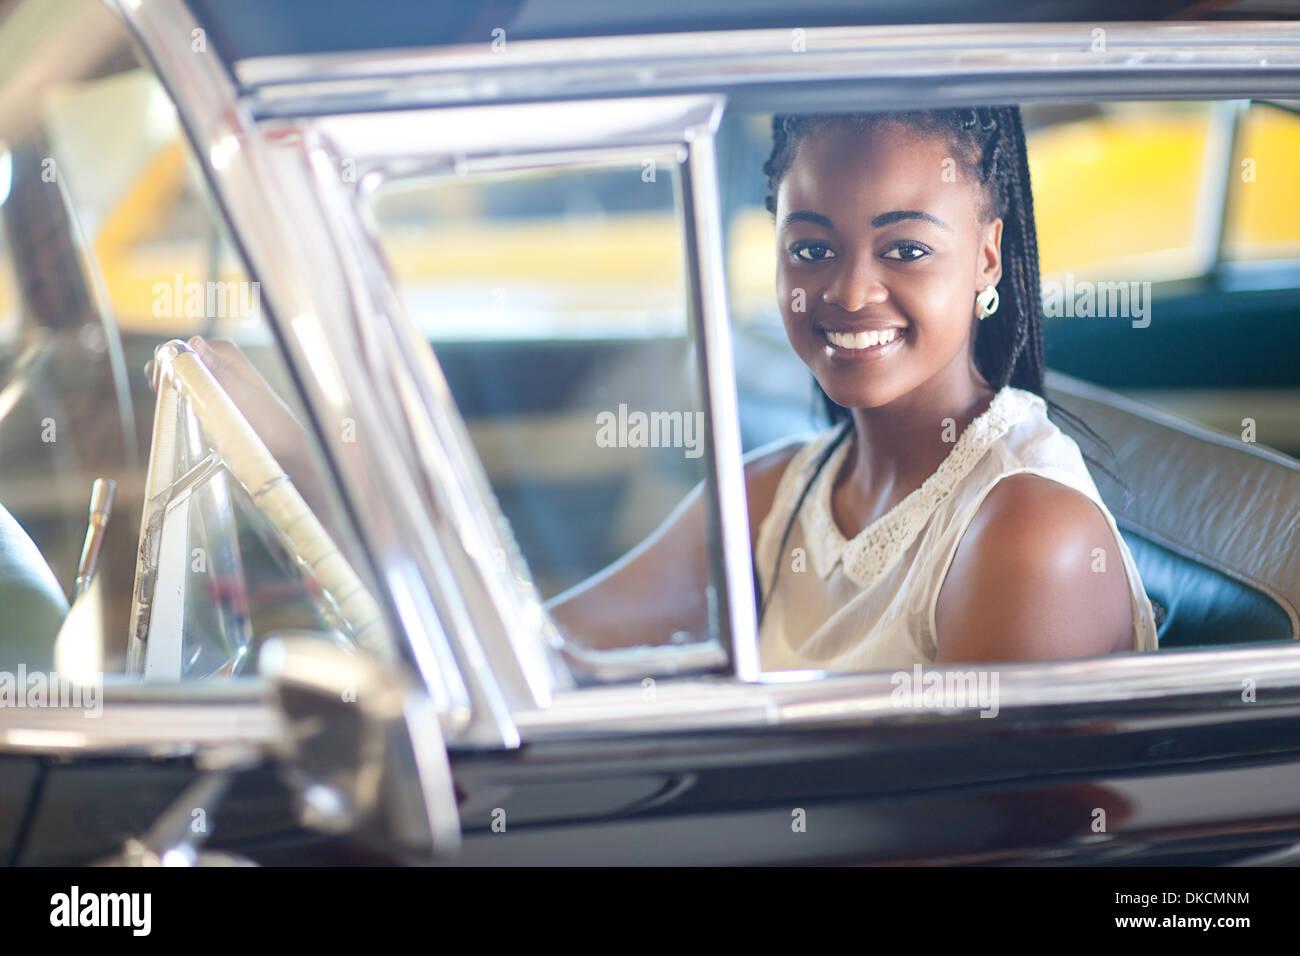 Mujer de peinado trenzado conducir coches antiguos Imagen De Stock